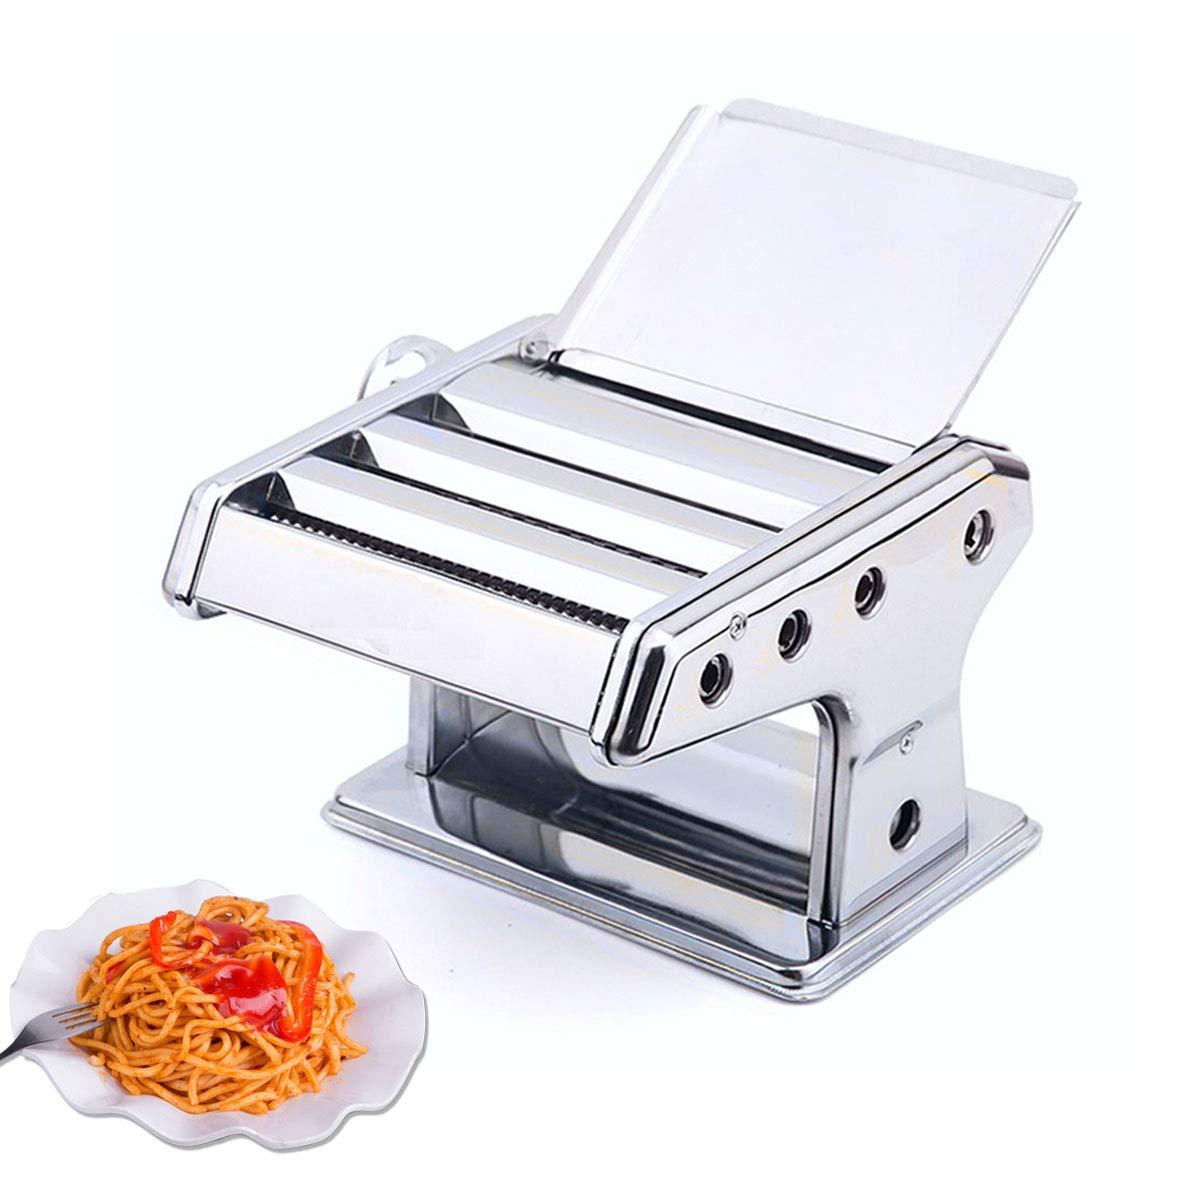 RRH Stainless Steel Pasta Maker 3 Cutting Die Stainless Steel Roller for Fresh Spaghetti Fettuccine Linguine Lasagna Noodle Hand Crank Cutter Pasta Machine by RRH